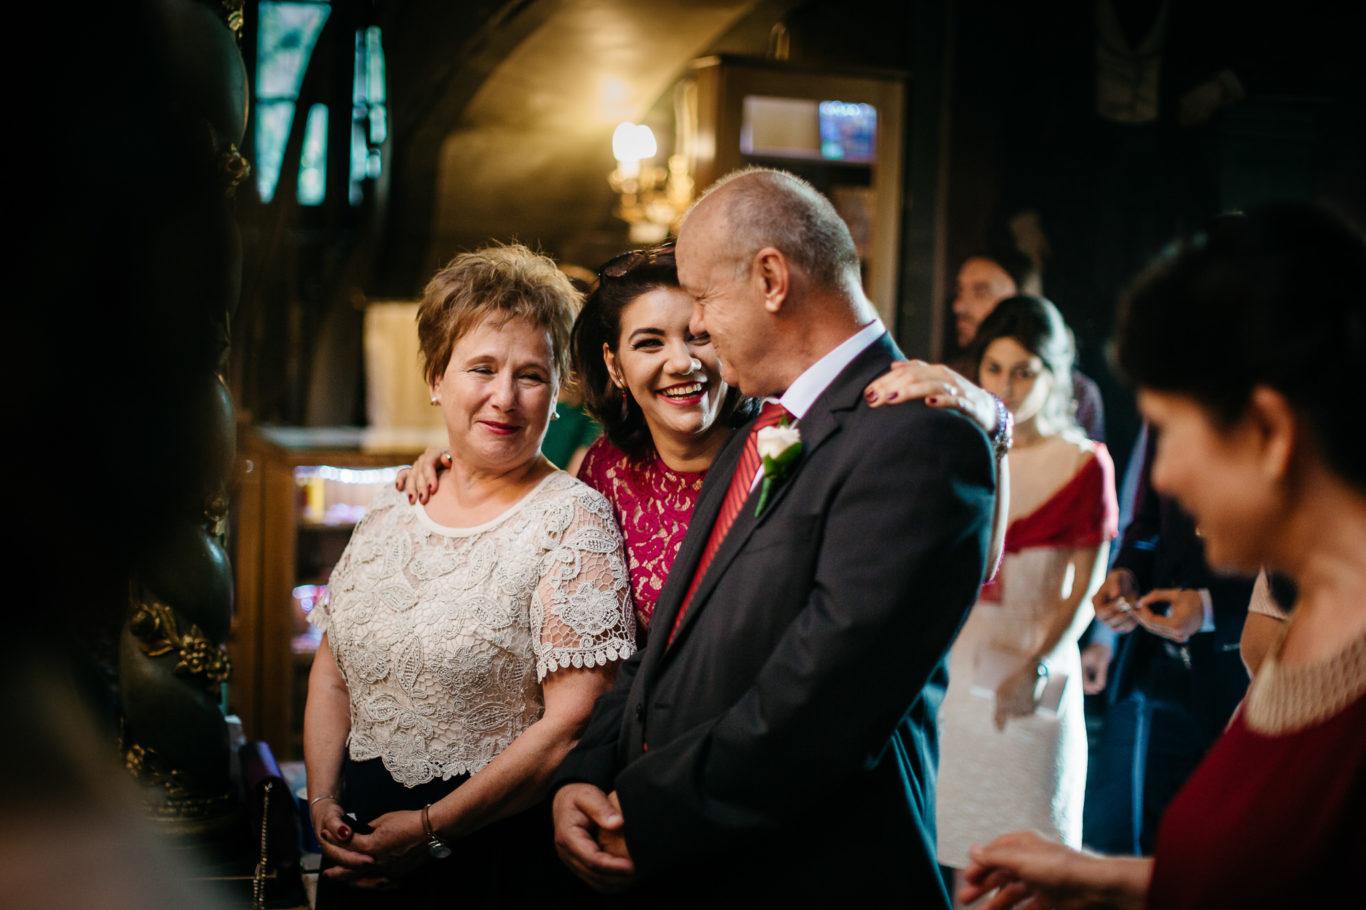 0426-Fotografie-nunta-Bucuresti-Oana-Catalin-fotograf-Ciprian-Dumitrescu-CDF_0647